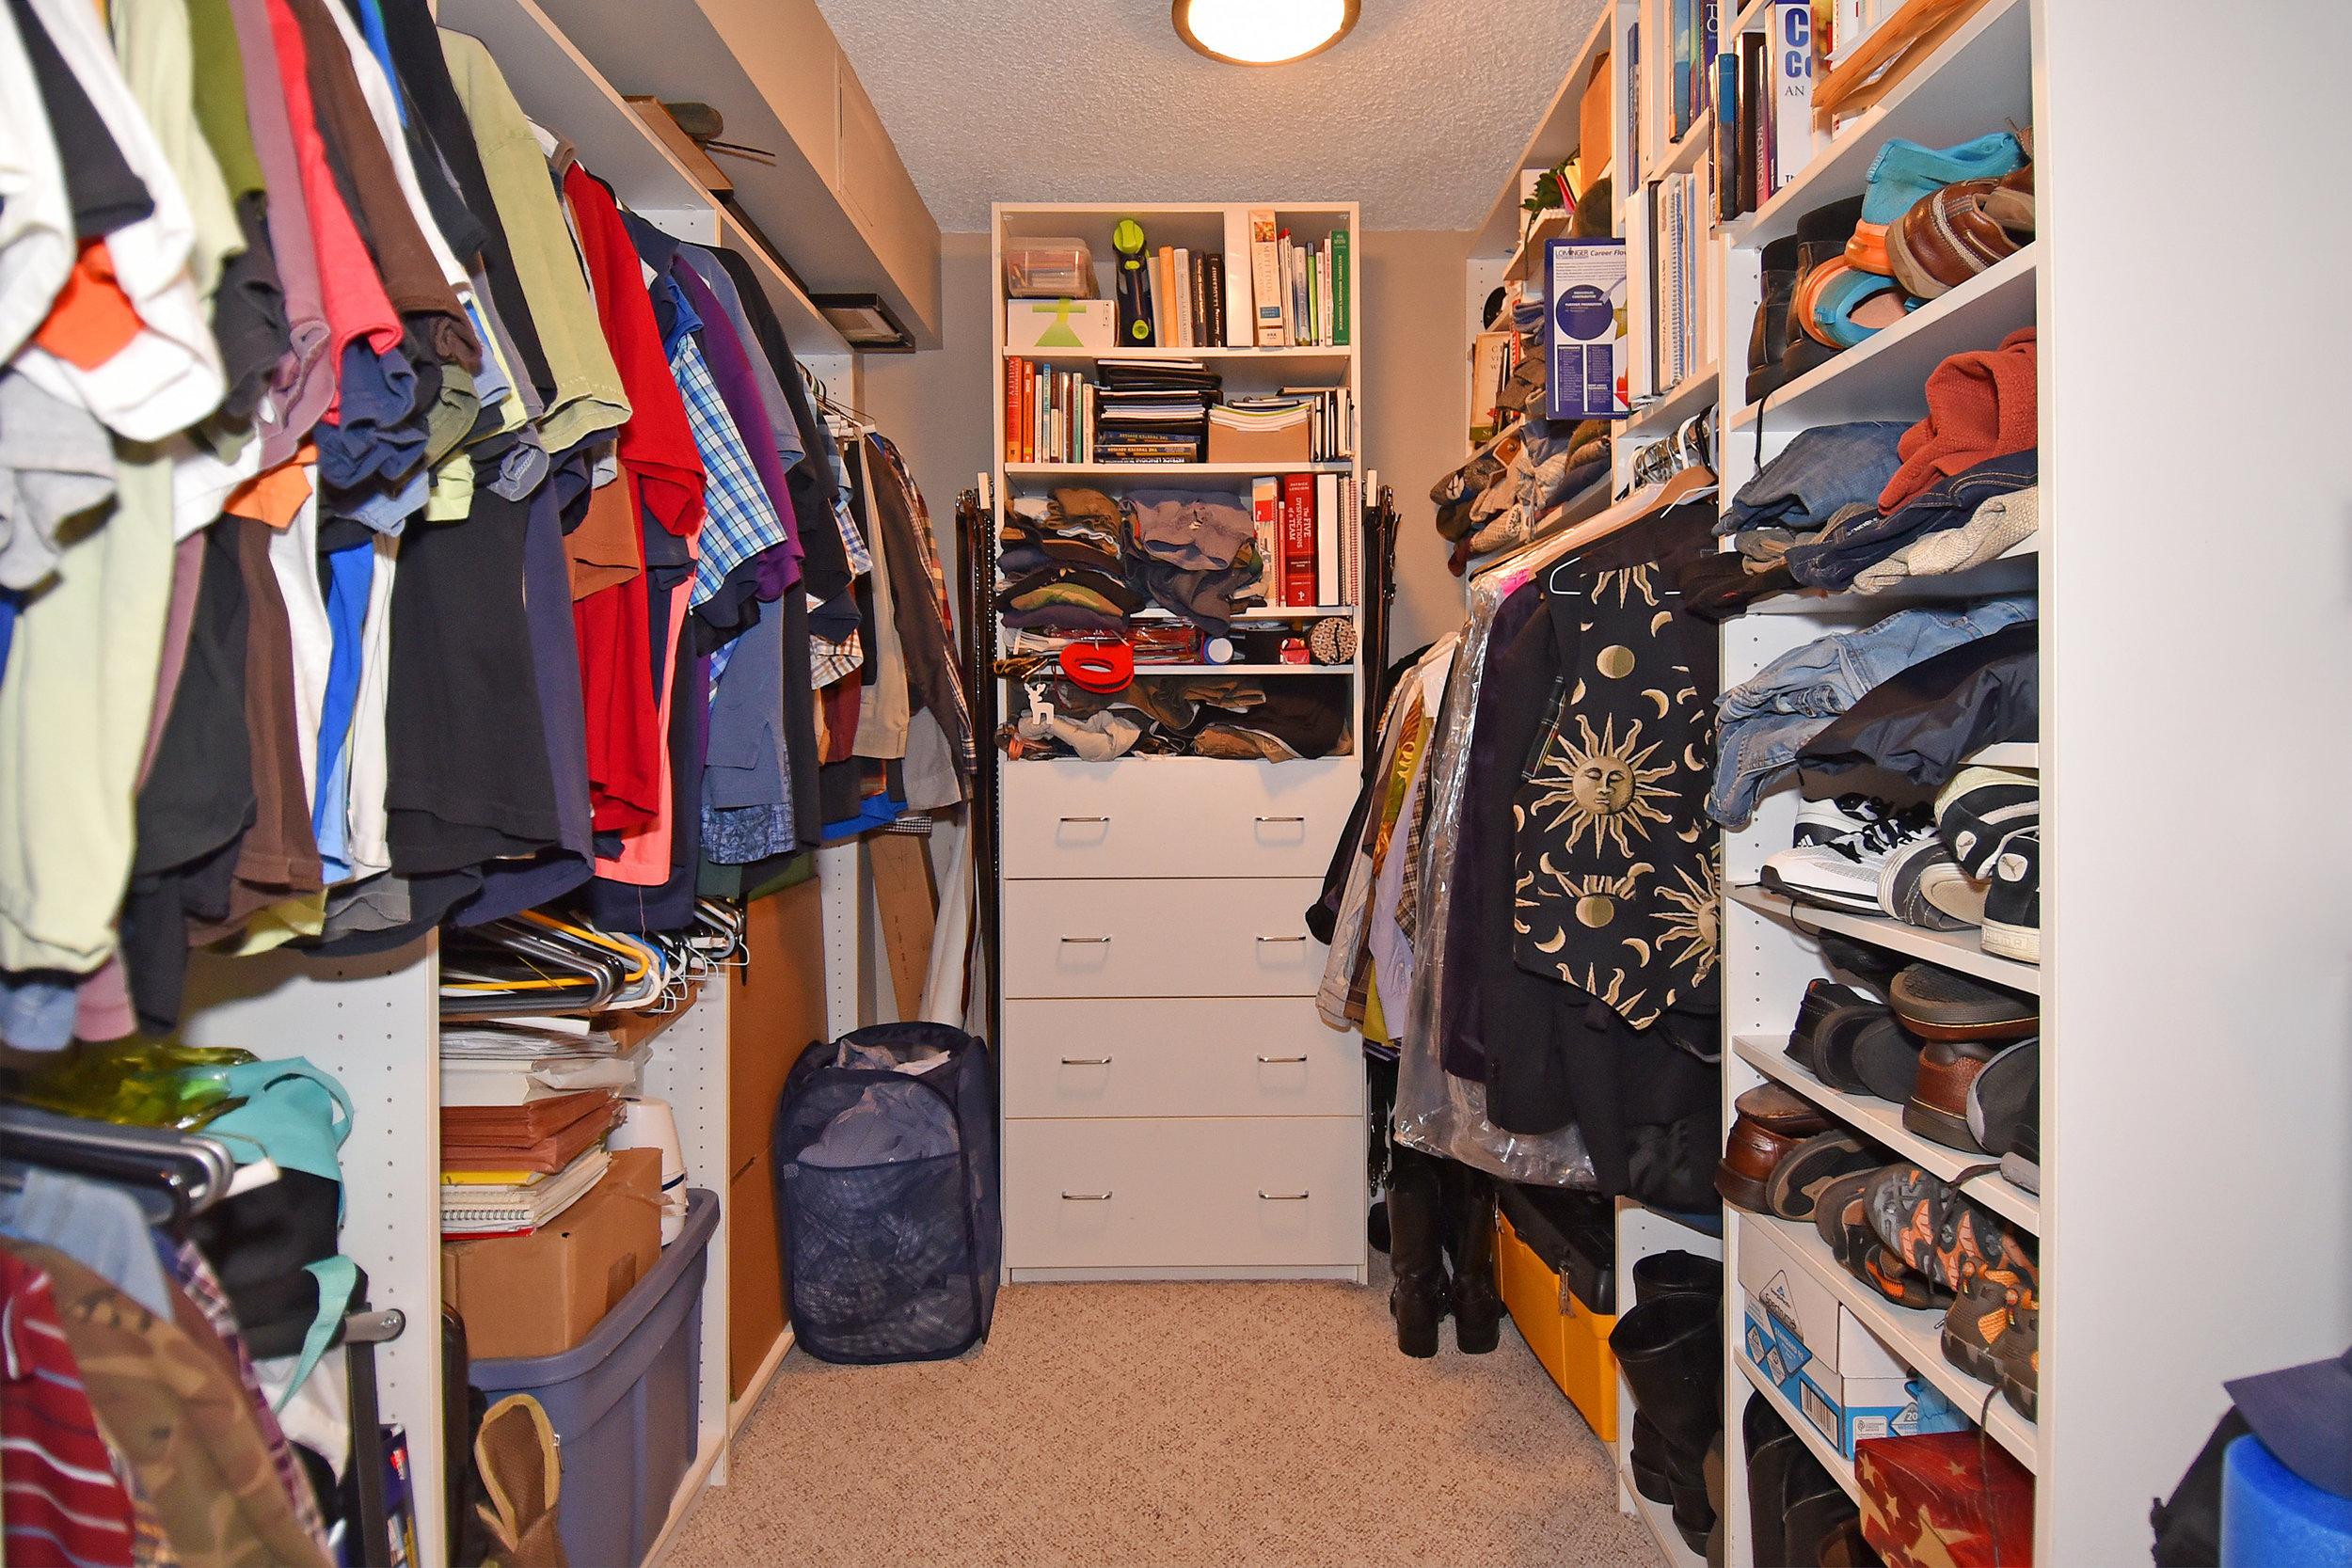 8 WI closet 1.JPG